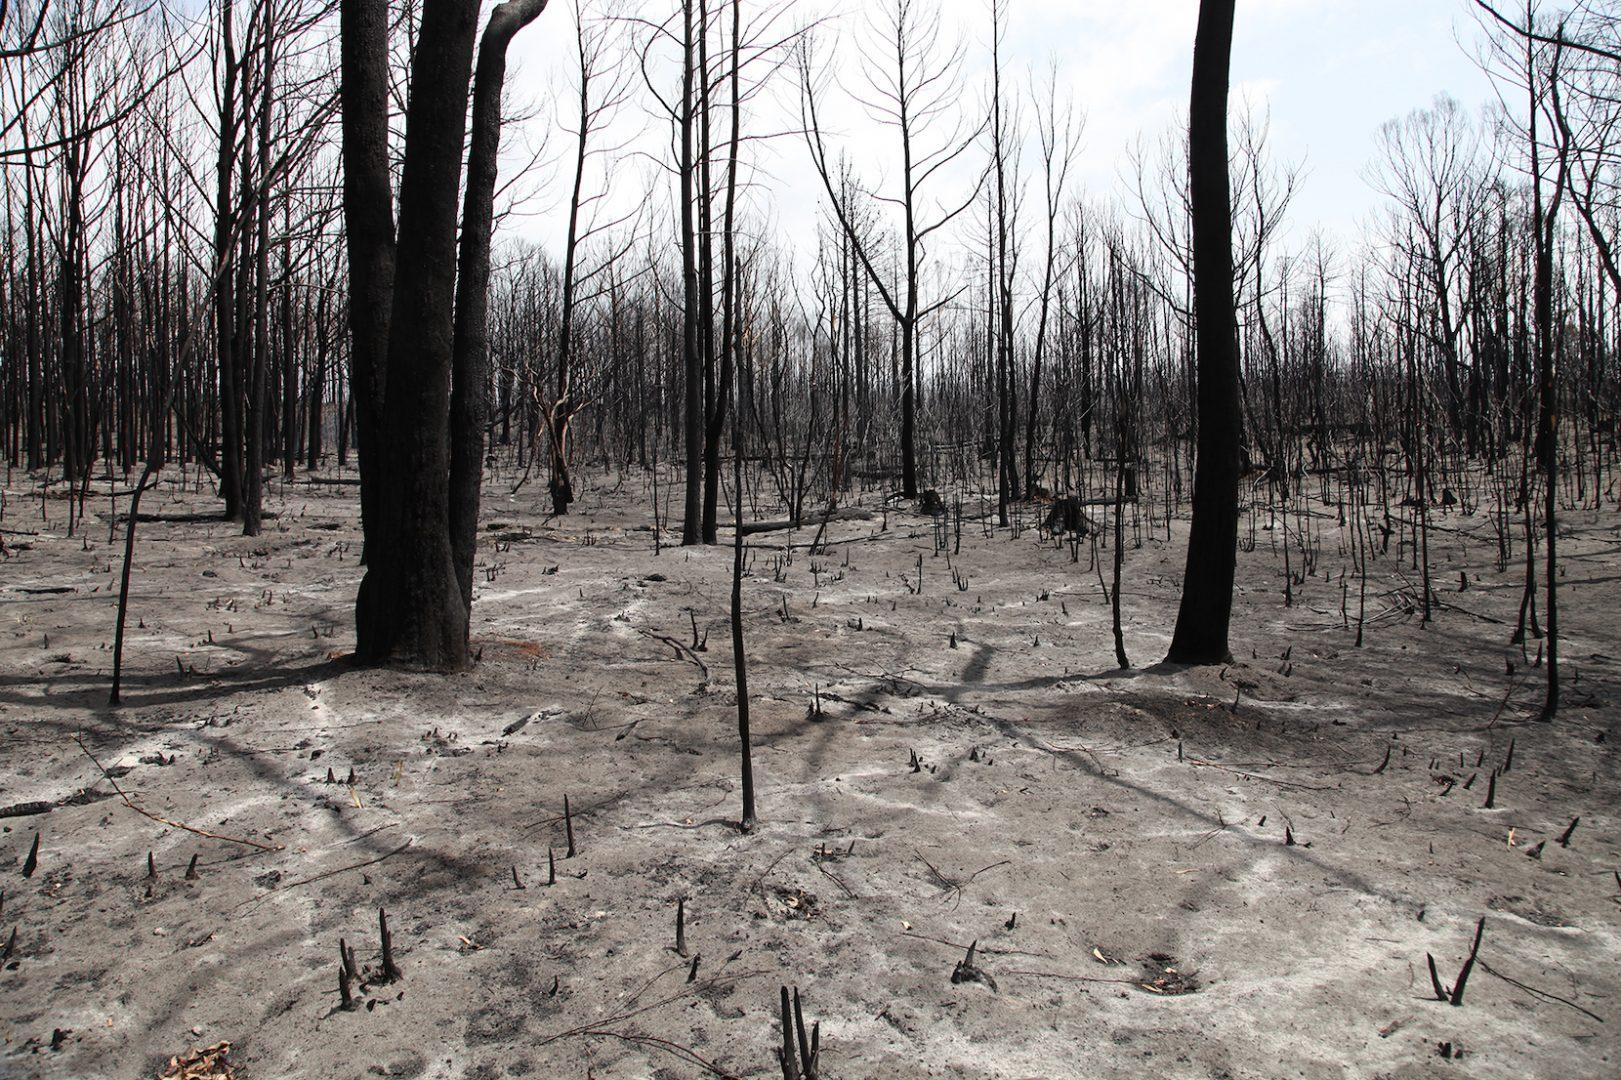 Artist and activist HAYDEN FOWLER on the Australian bushfires 7